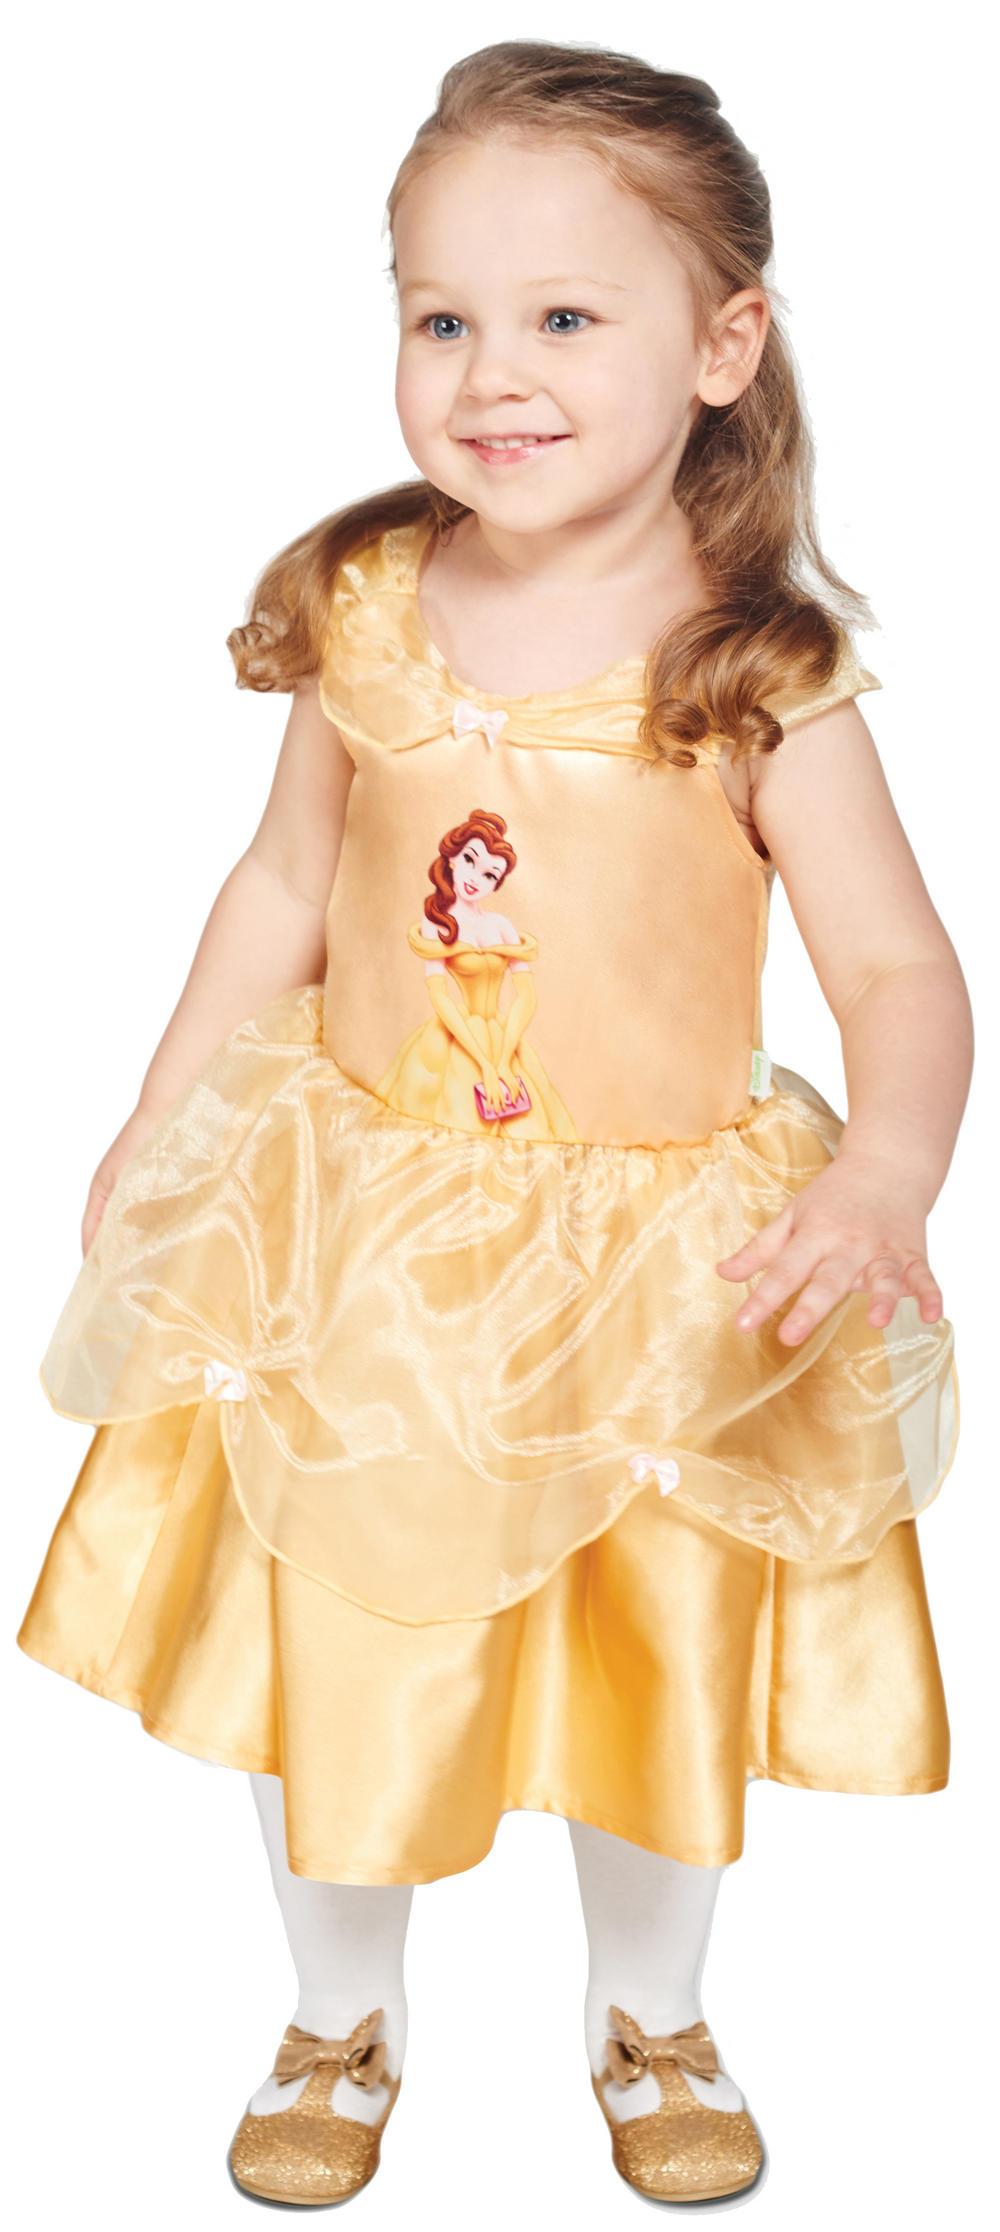 Disney Princess Belle Character Icon Dress Infants Costume